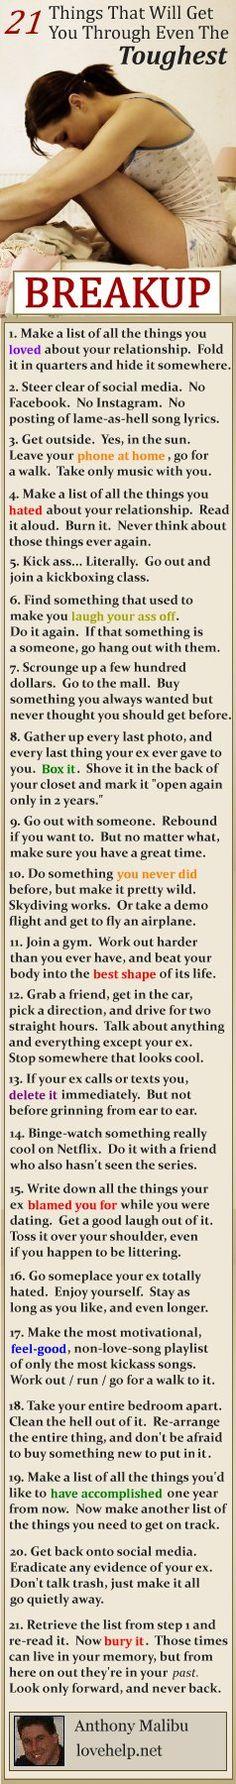 21 Ways to Get Over Your Ex Girlfriend  #ExGirlfriend #ExBack #GetHerBack